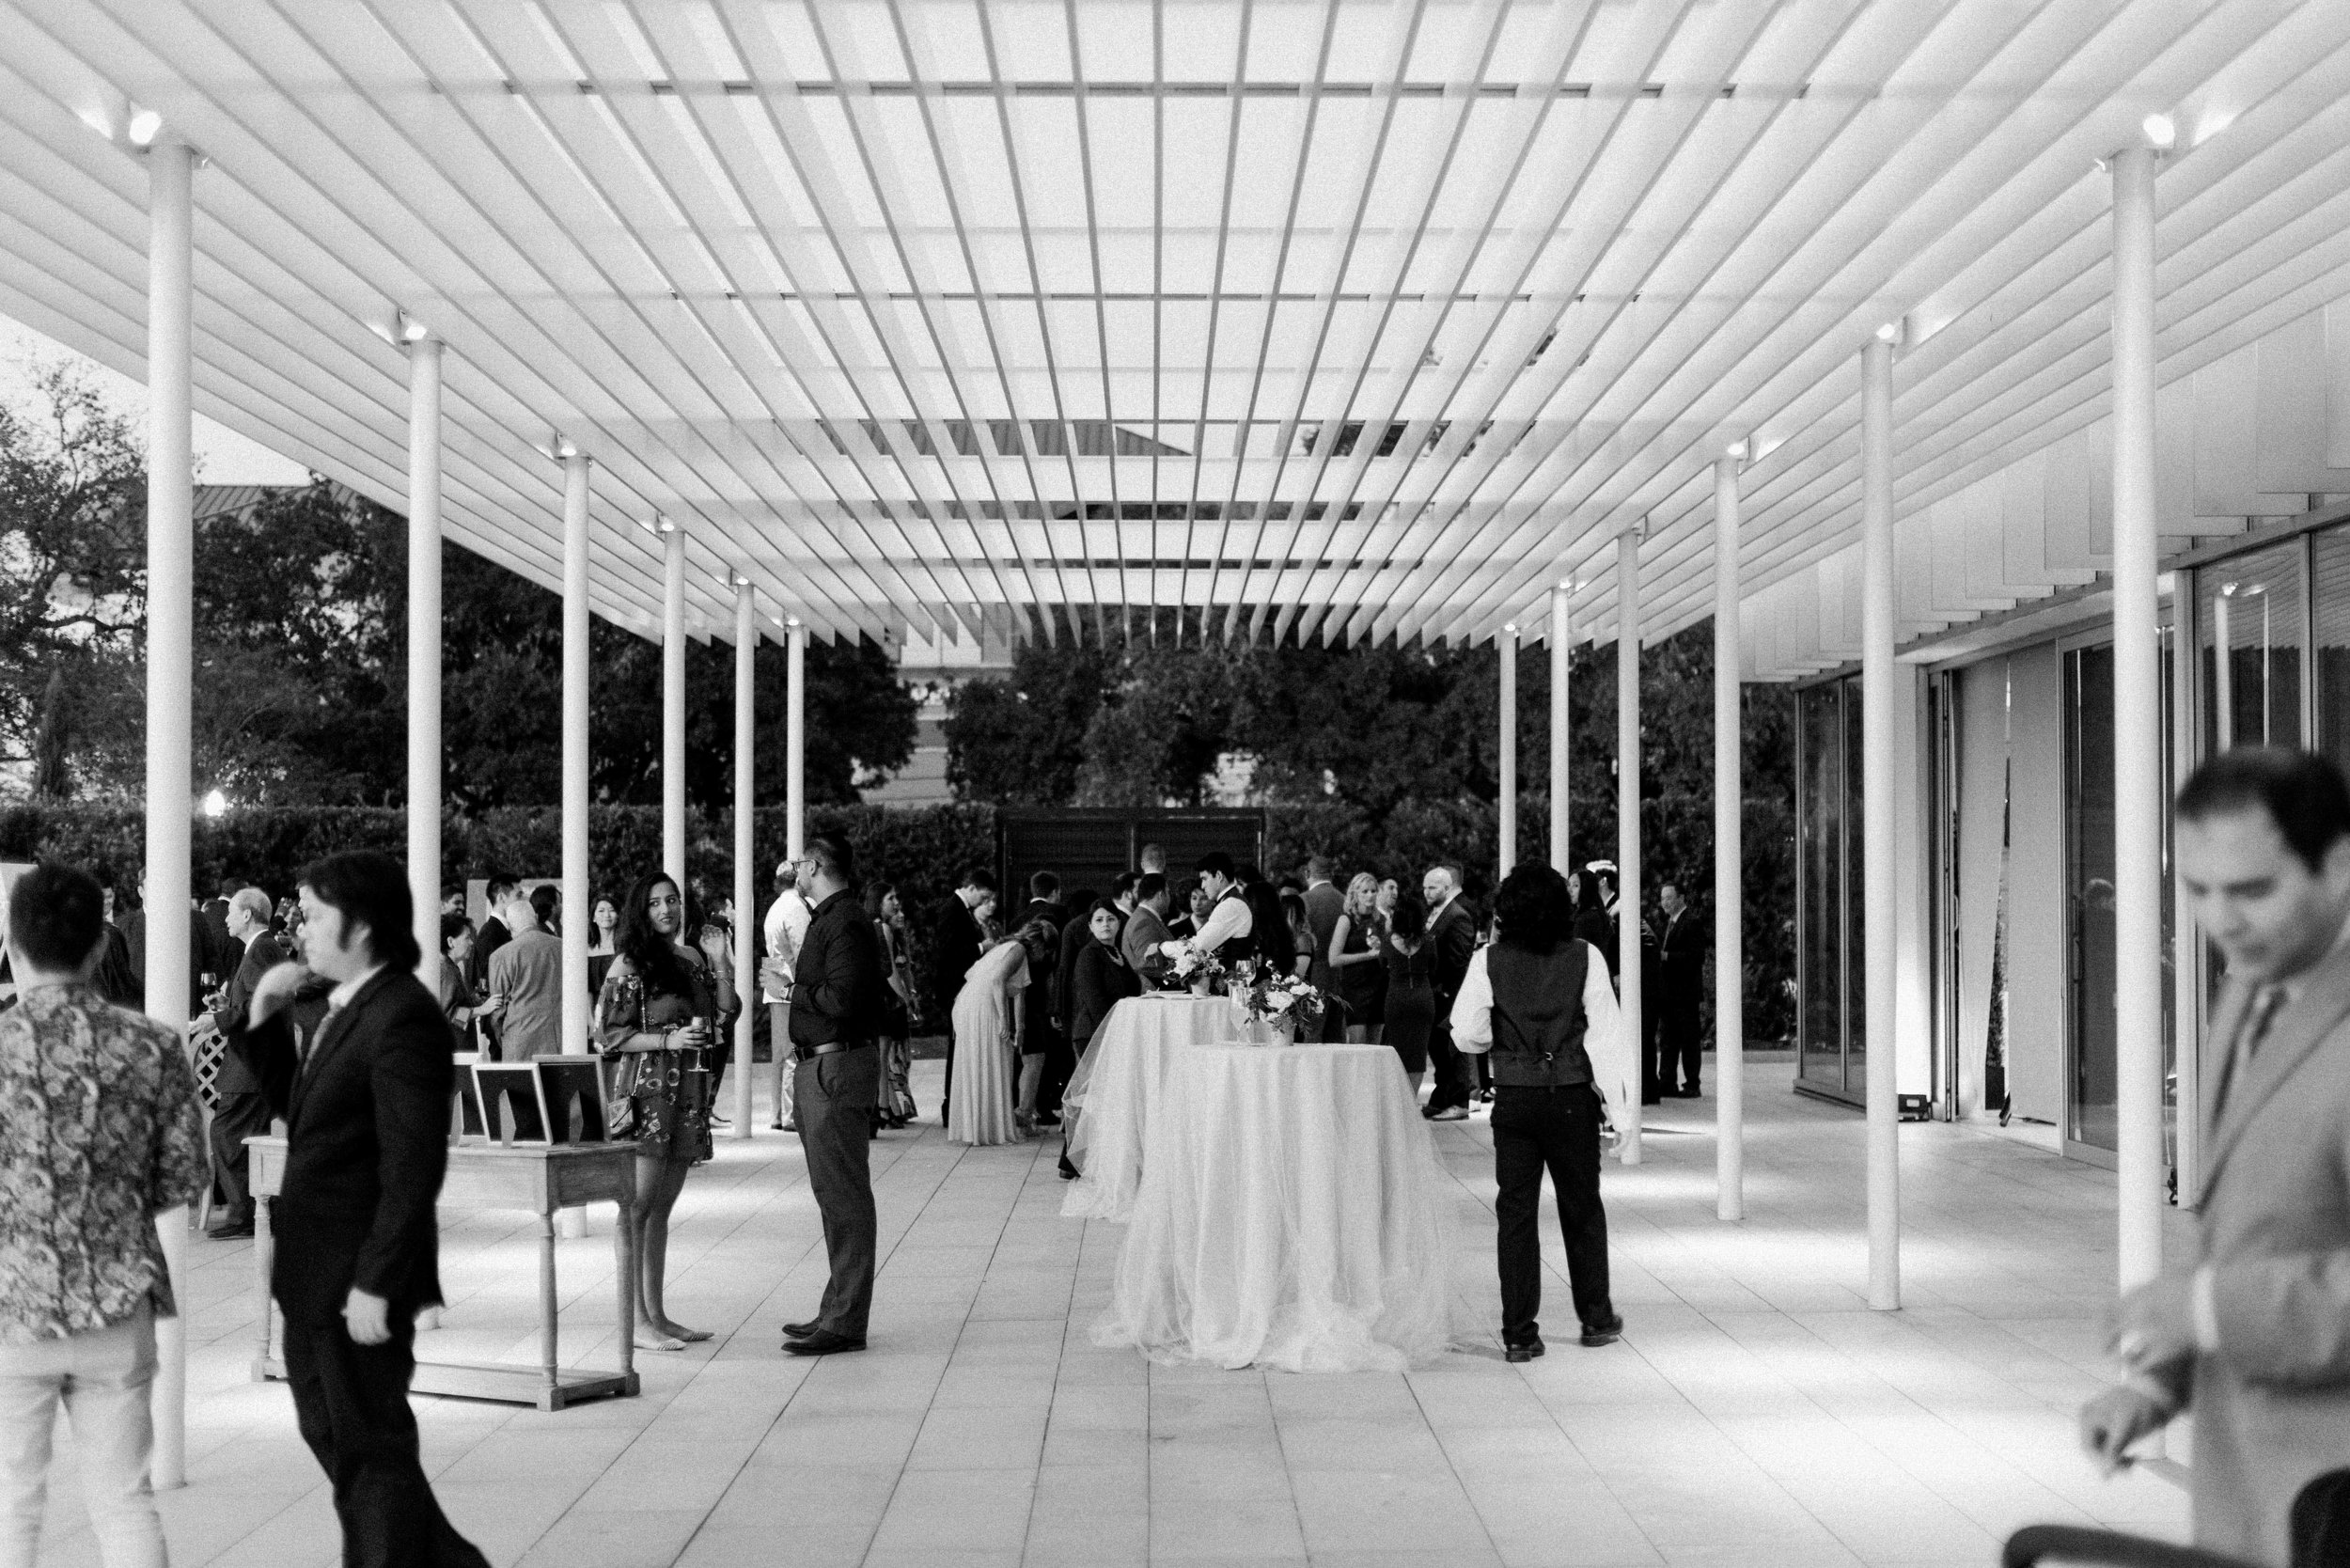 Martha-Stewart-Wedding-Dana-Fernandez-Photography-Josh-Texas-Film-Houston-Wedding-Fine-Art-Photographer-McGovern-Centennial-Gardens-Top-Best-49.jpg